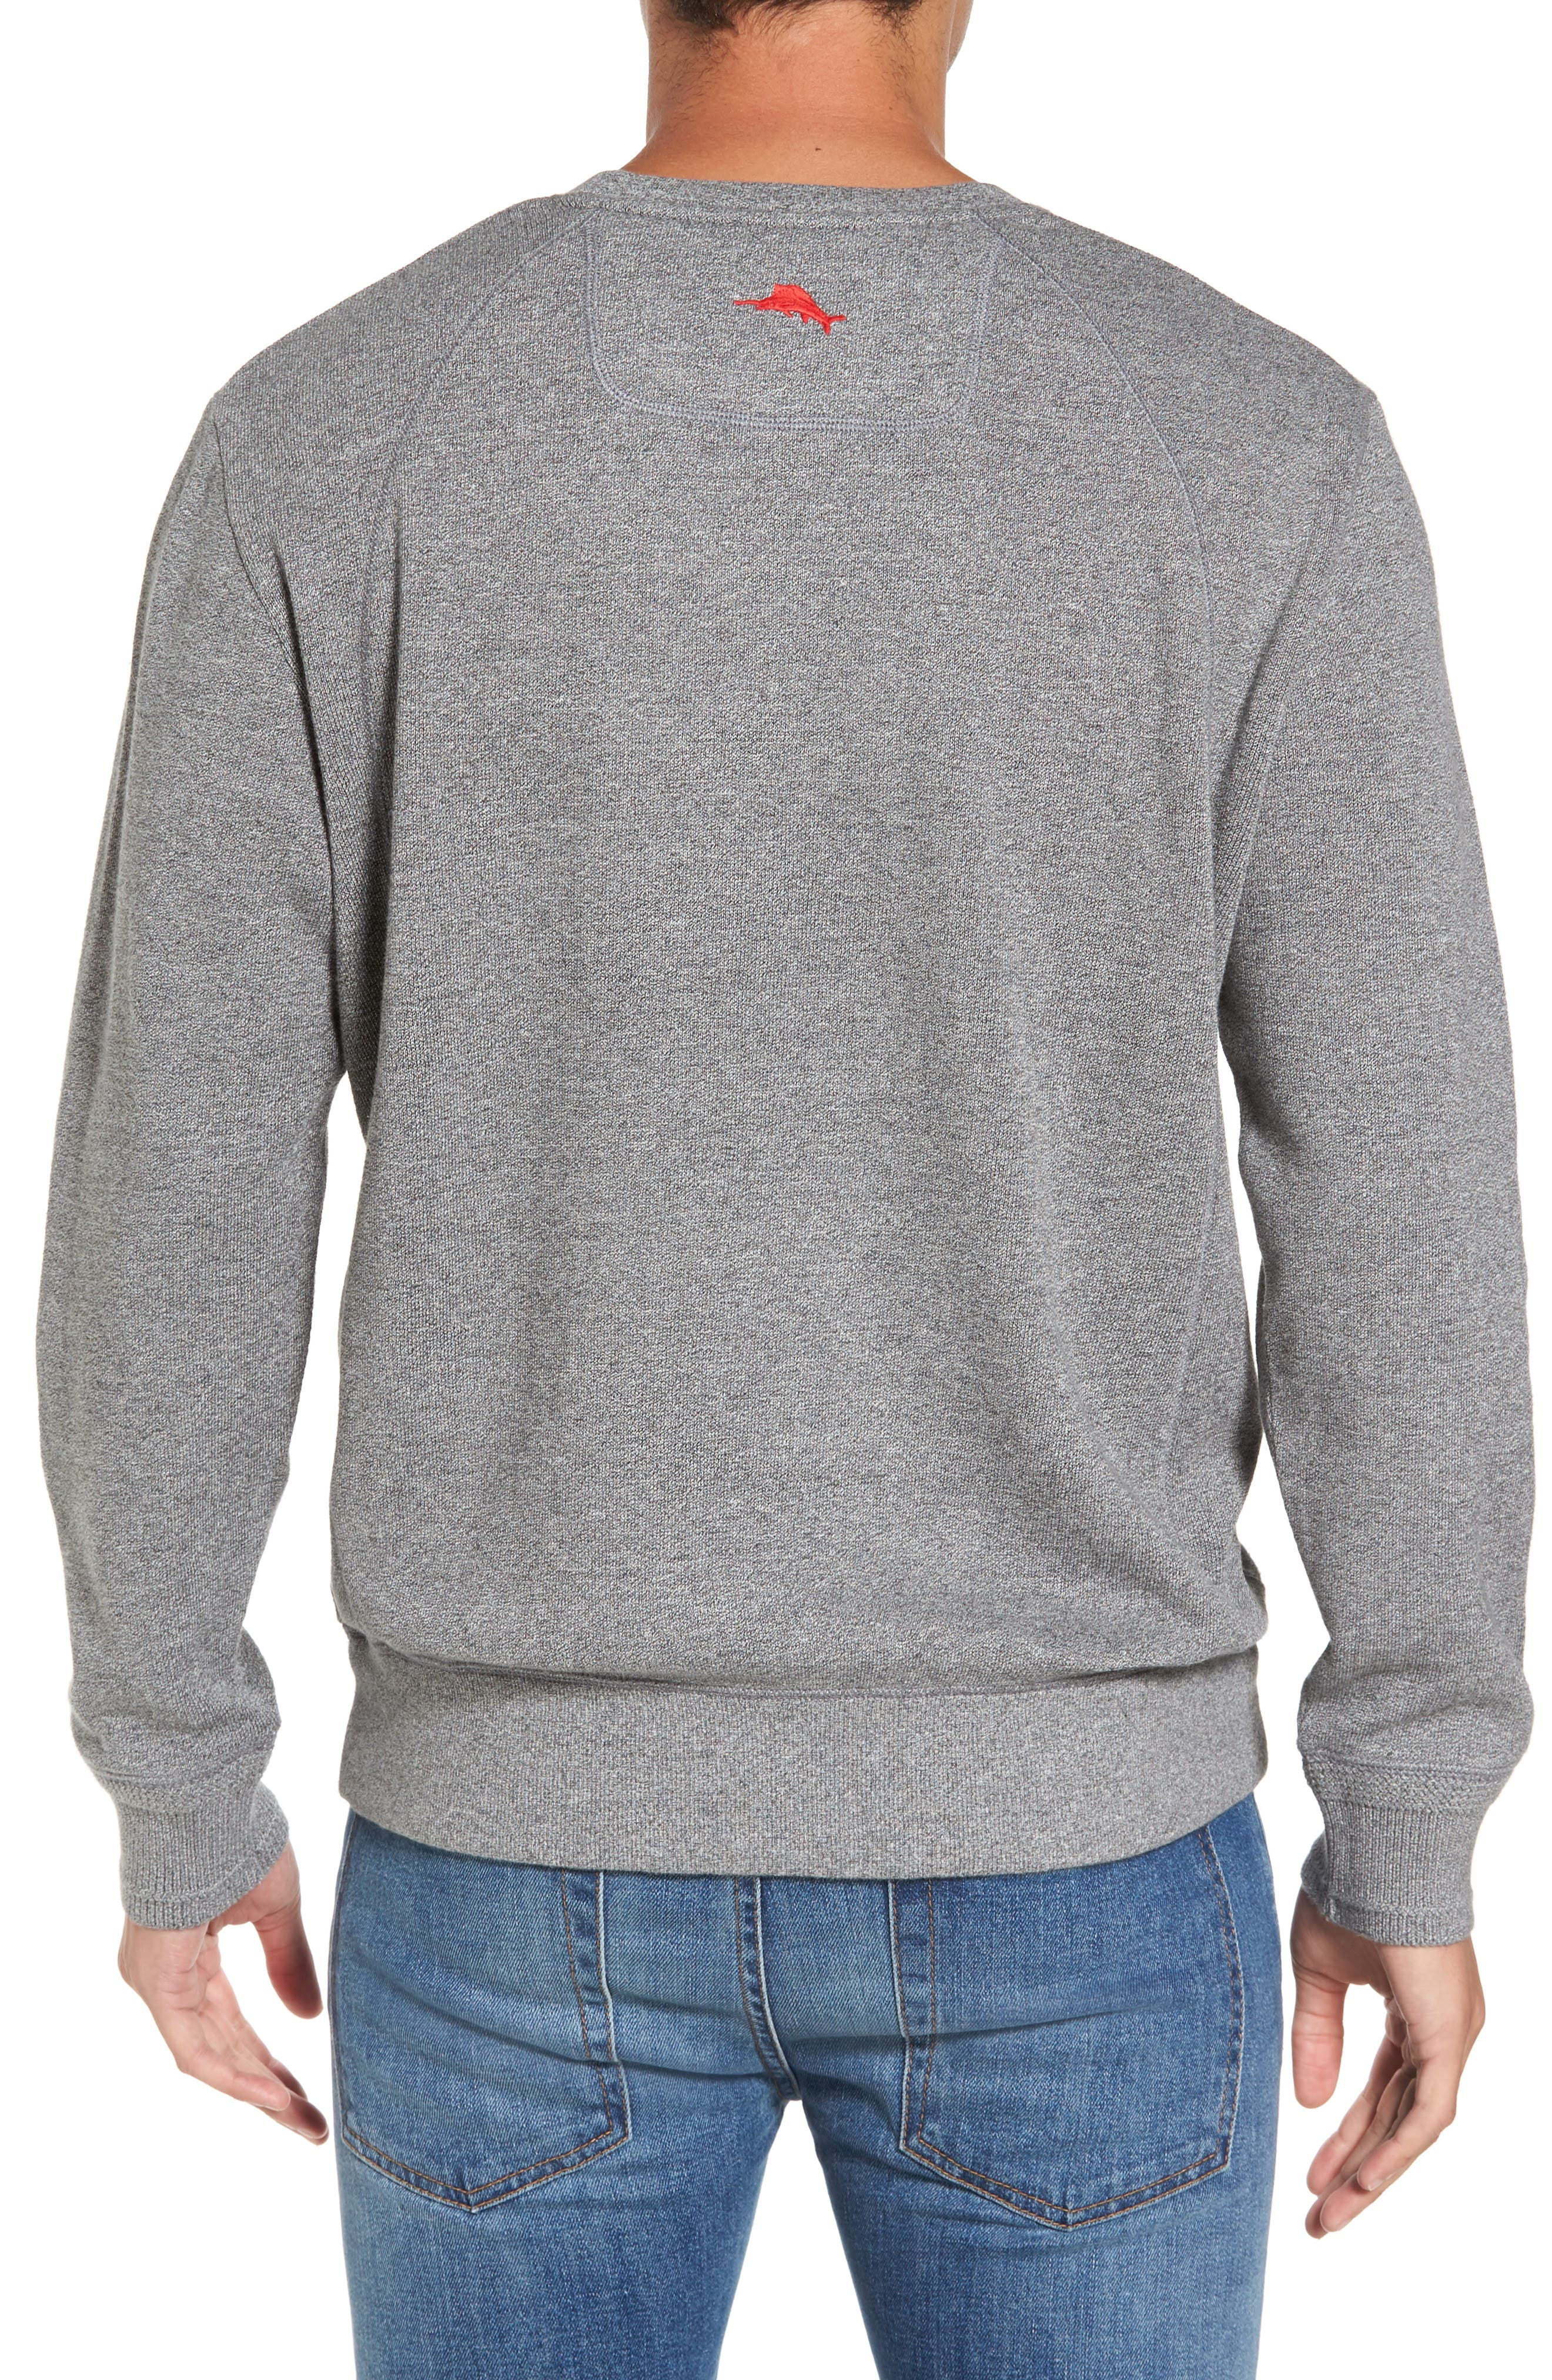 NFL Stitch of Liberty Embroidered Crewneck Sweatshirt,                             Alternate thumbnail 40, color,